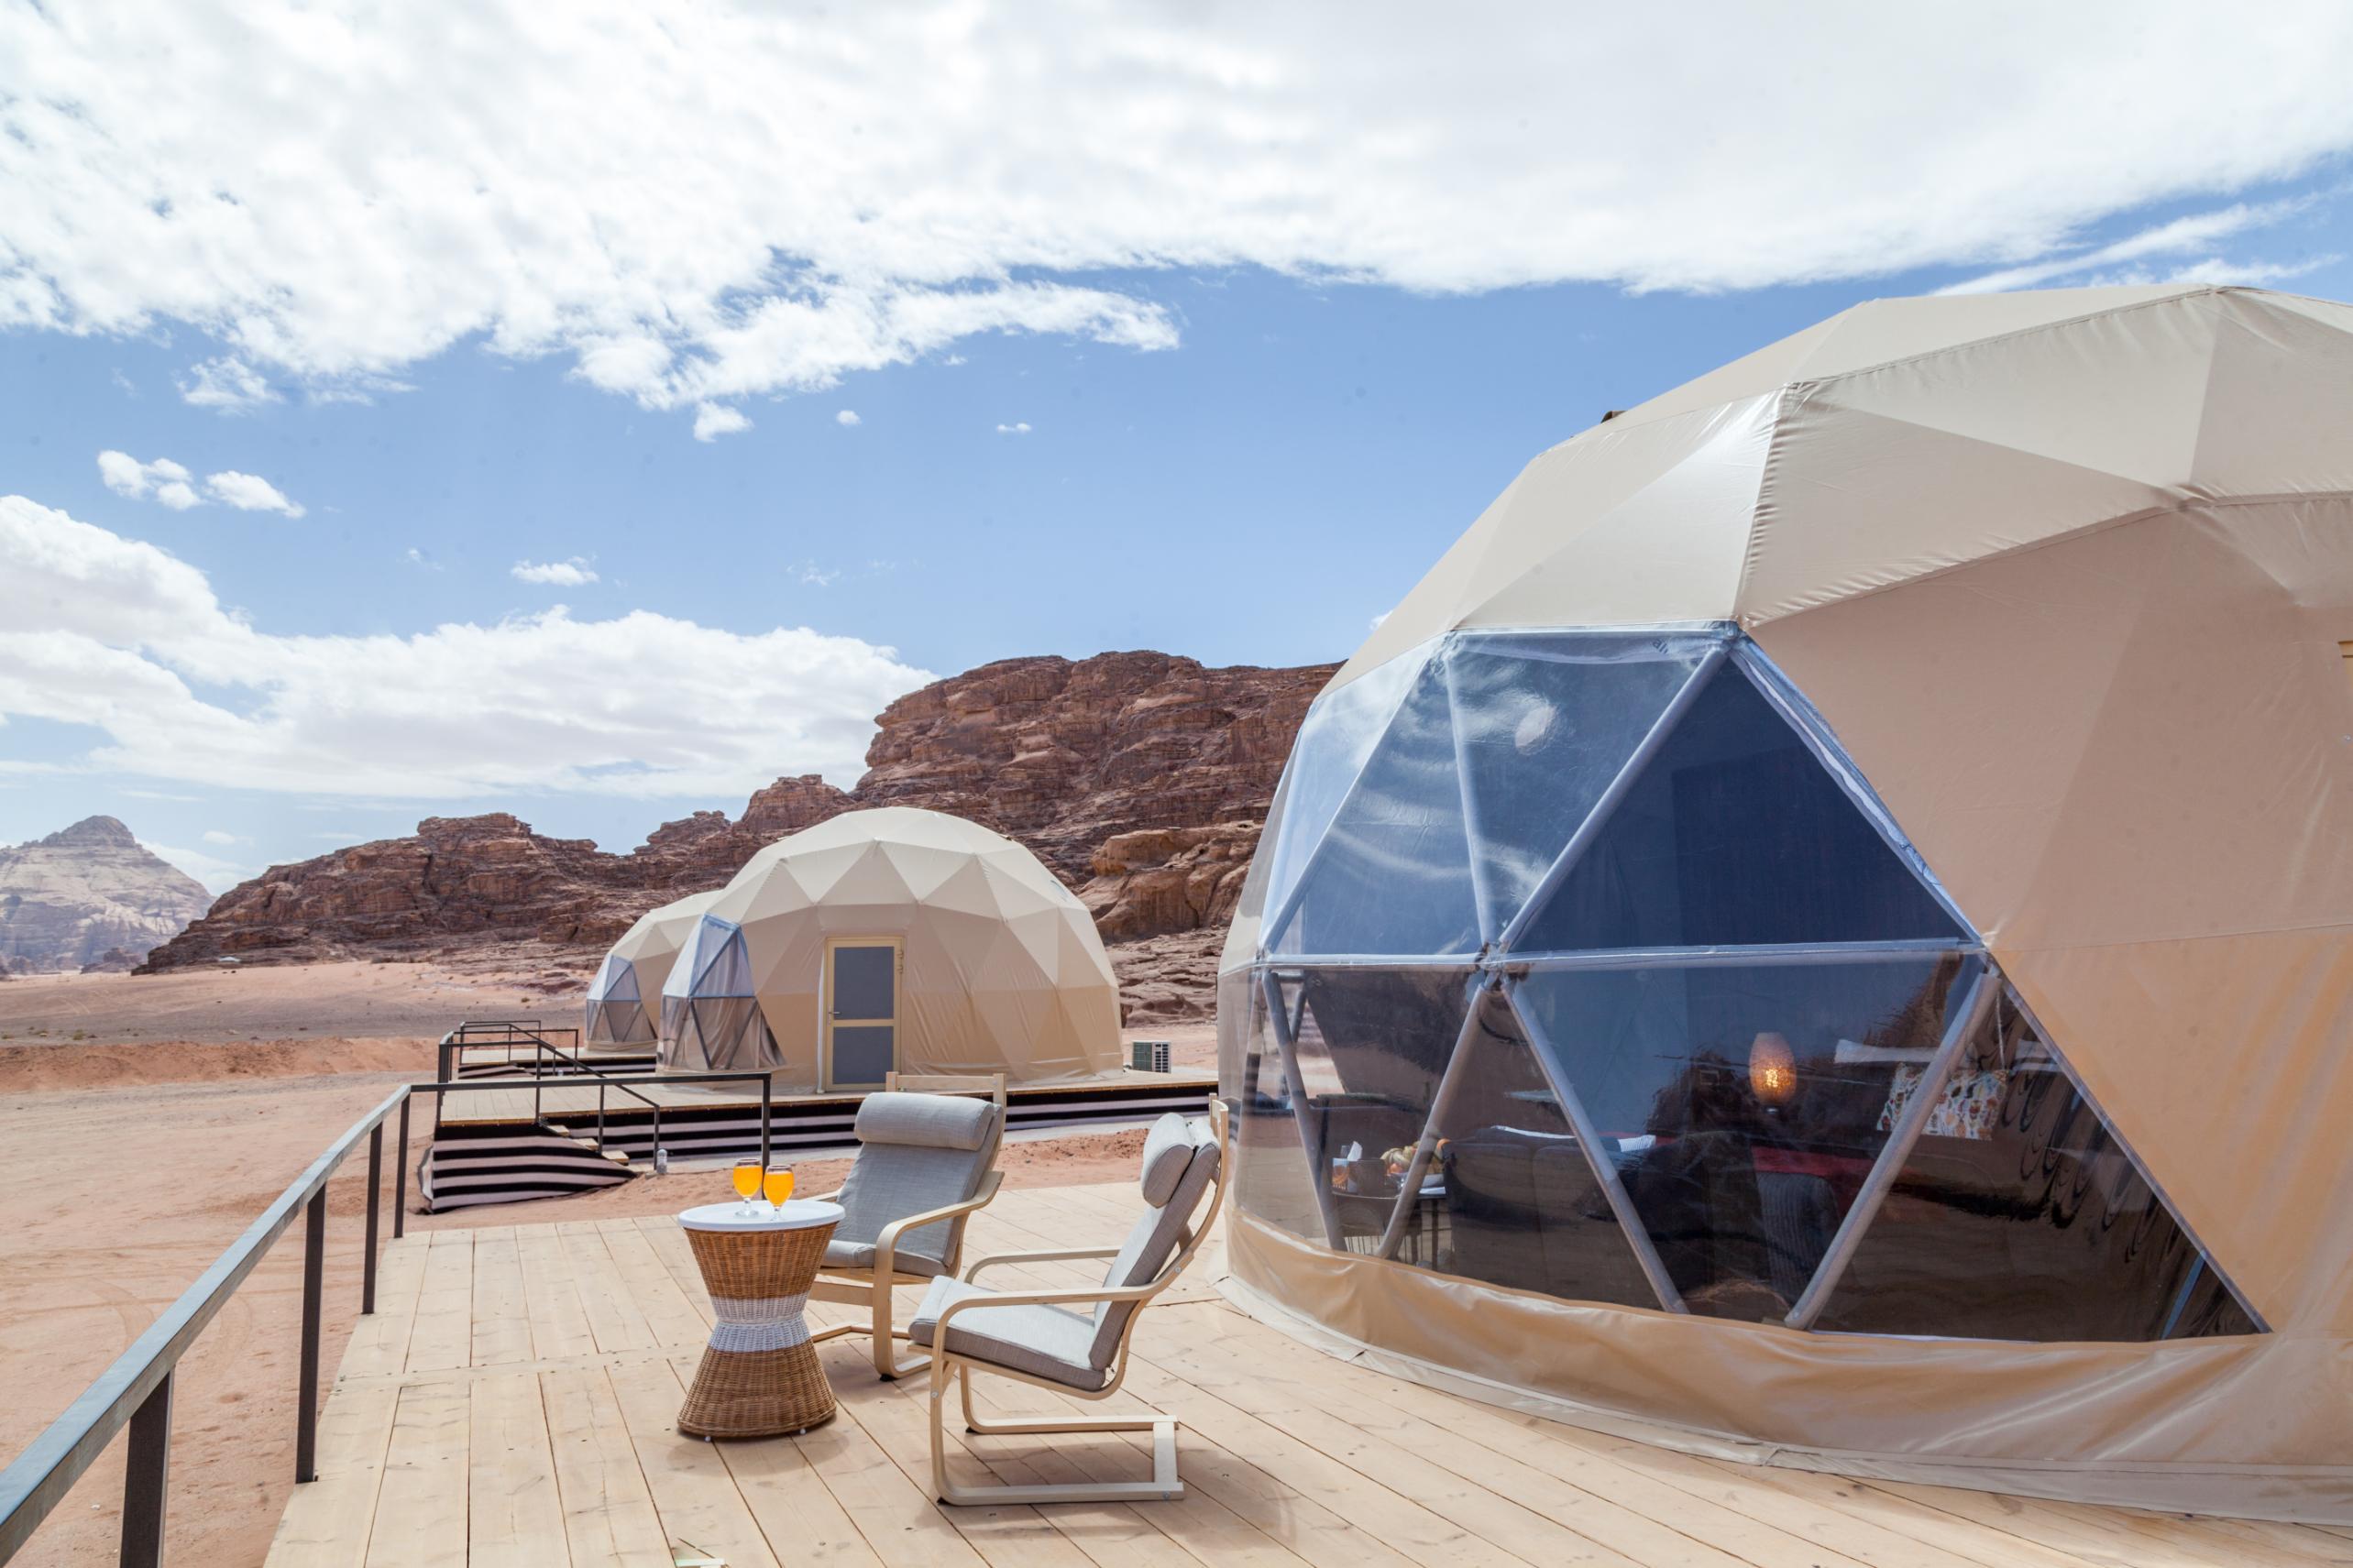 martian camping pods in wadi rum desert